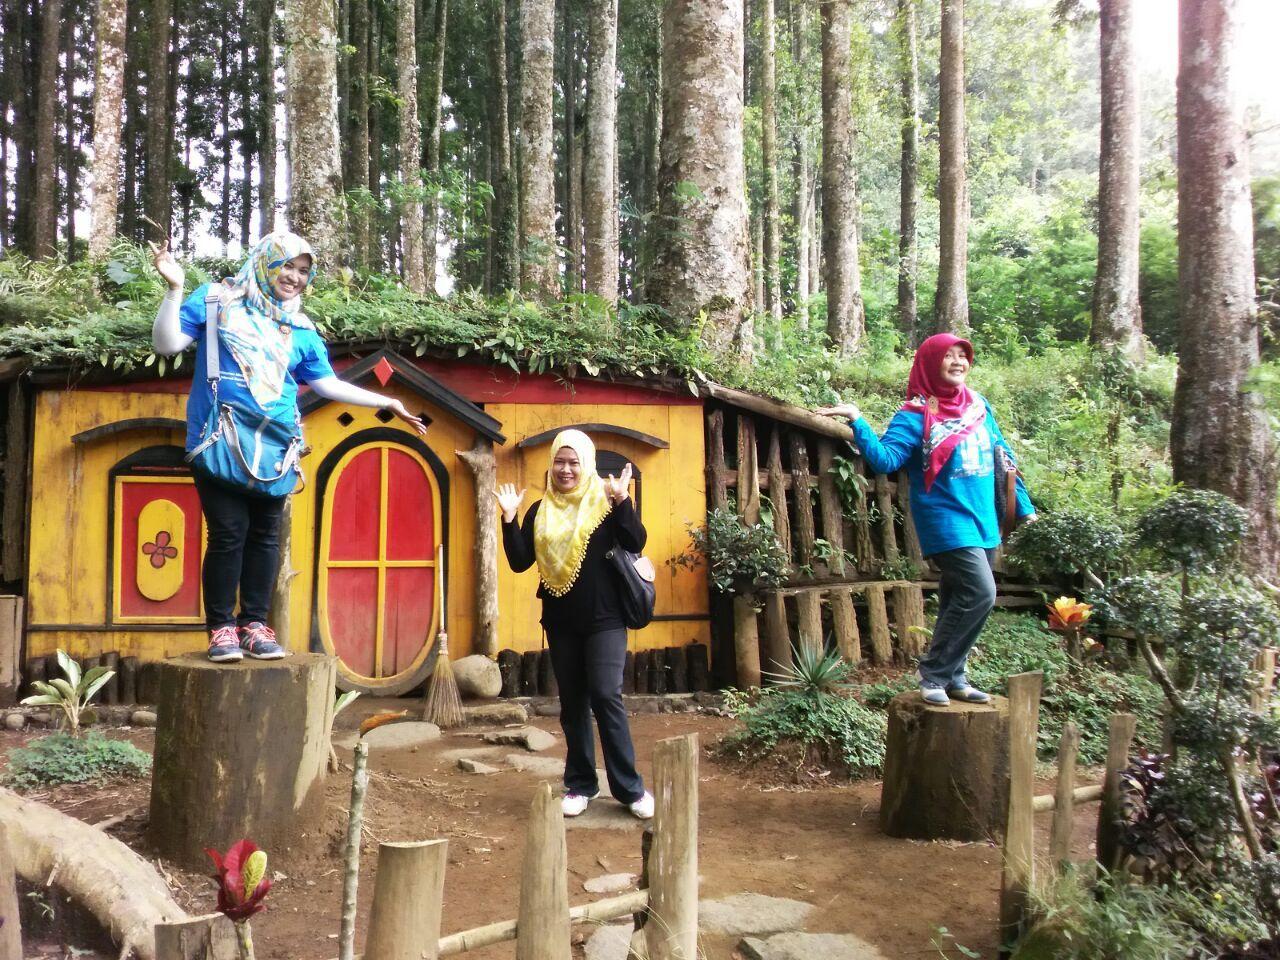 Kampung Kurcaci Desa Serang Purbalingga Yuuk Wefie Kecamatan Karangreja Berada